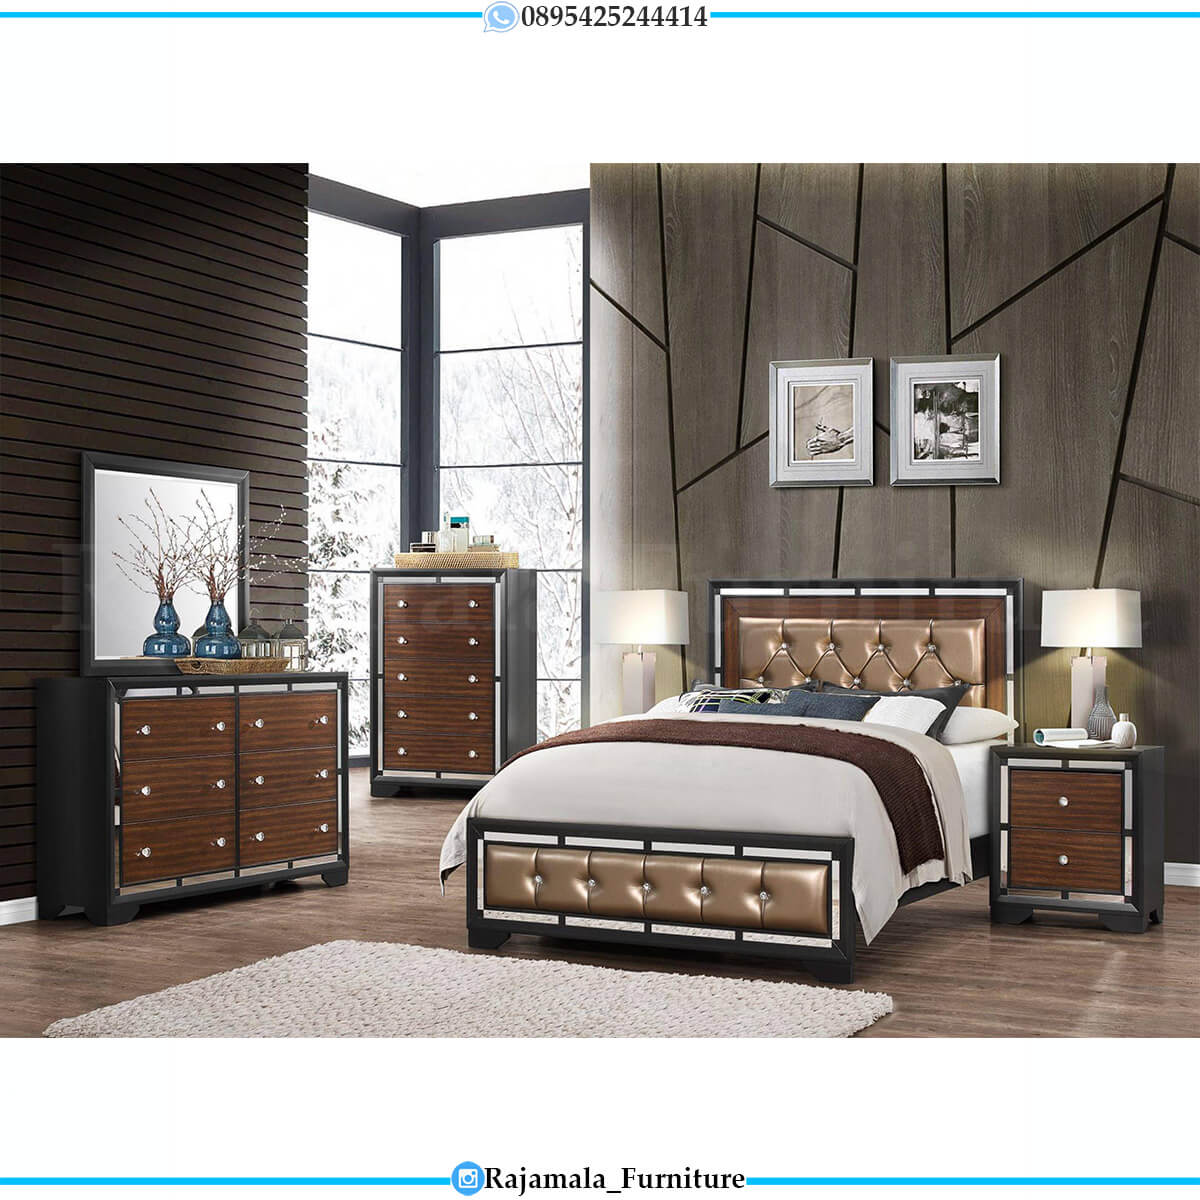 Beauty Desain Tempat Tidur Minimalis Jepara Luxury Type RM-0691